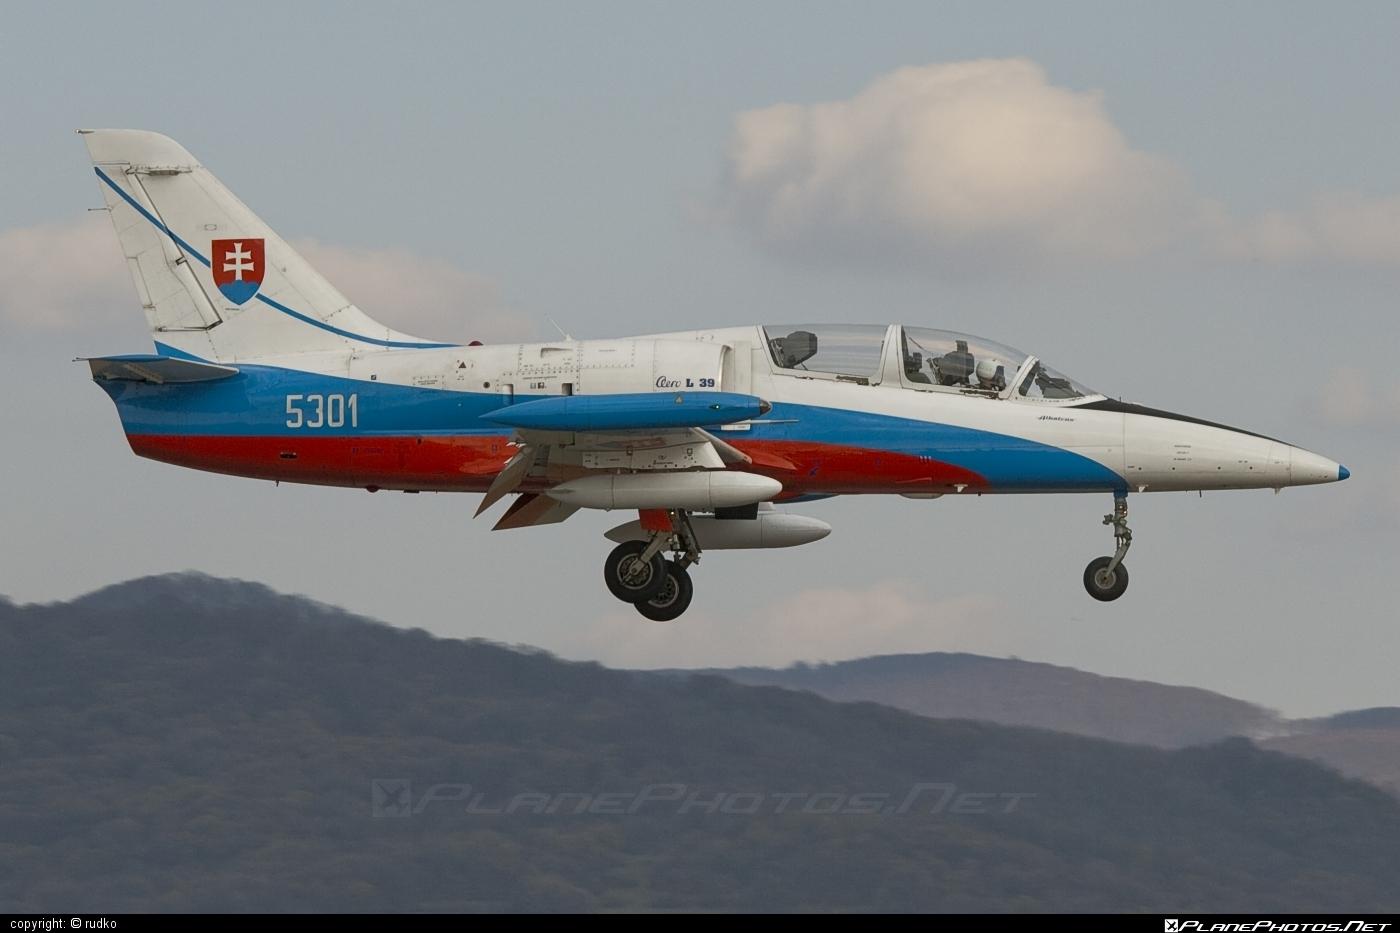 Aero L-39CM Albatros - 5301 operated by Vzdušné sily OS SR (Slovak Air Force) #aero #aerol39 #aerol39albatros #aerol39cmalbatros #albatros #l39 #l39cm #l39cmalbatros #slovakairforce #vzdusnesilyossr